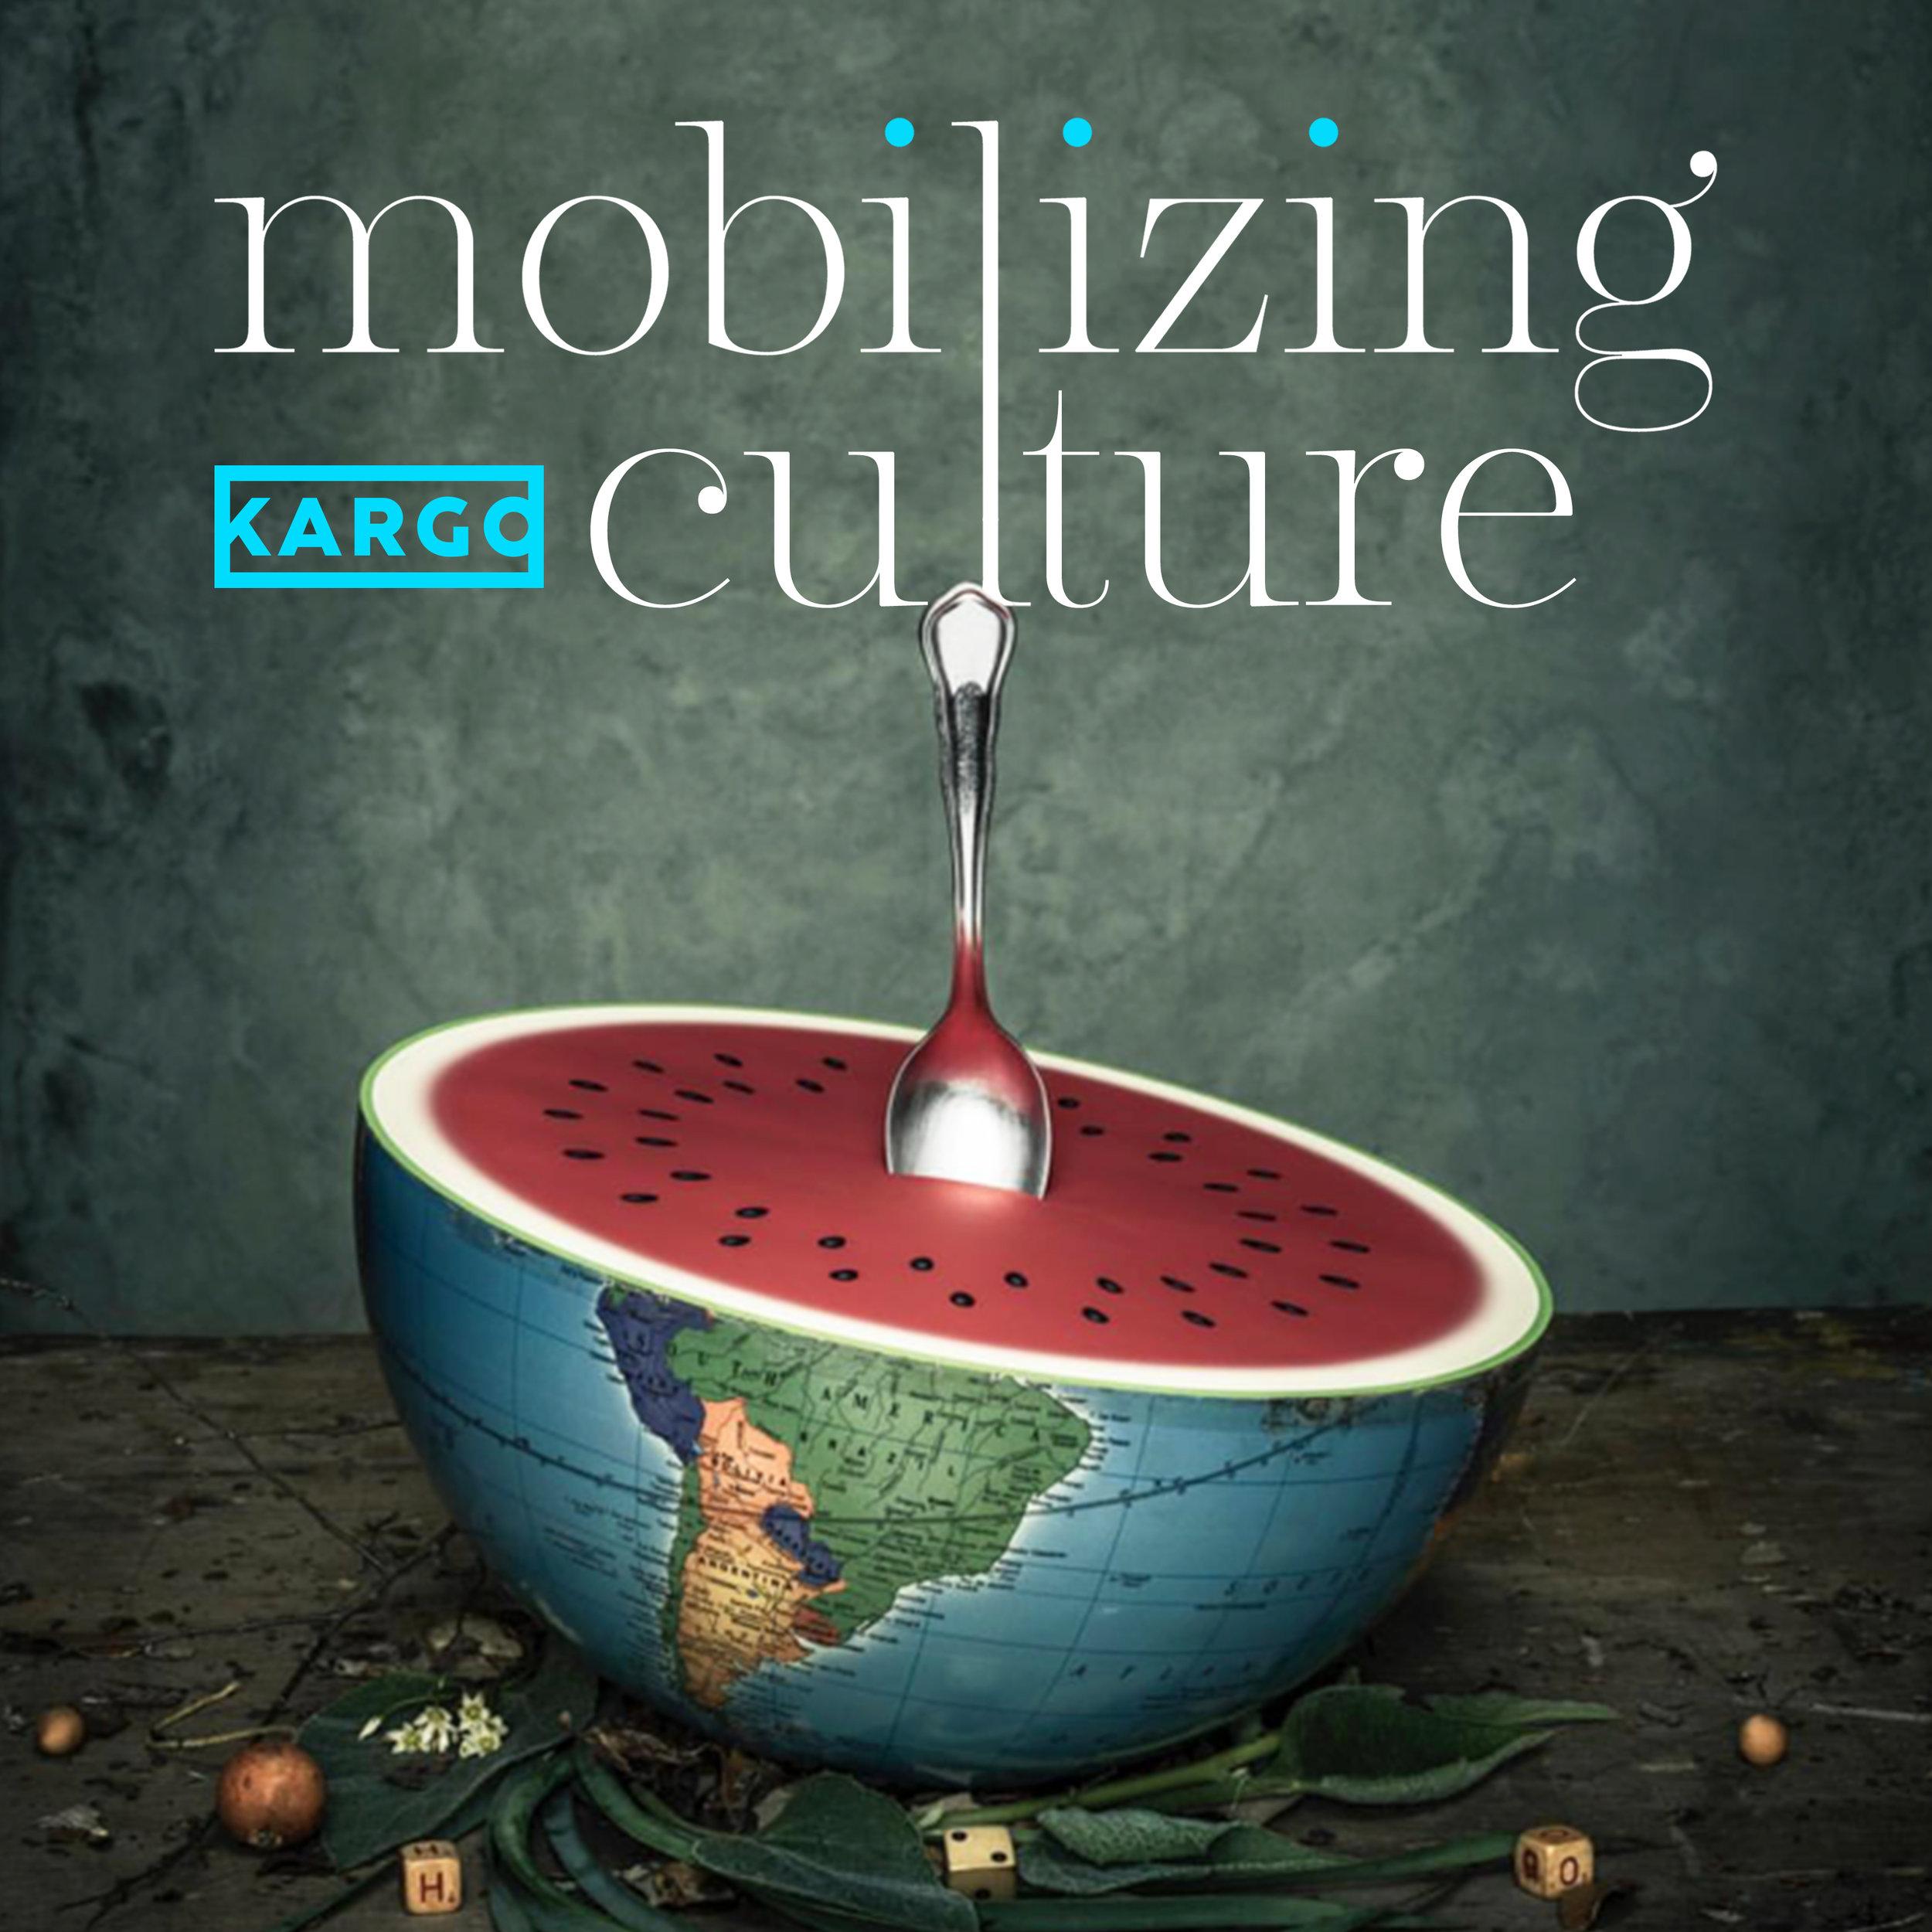 Mobilizingculture_podcast_images_05.04.17_2.jpg